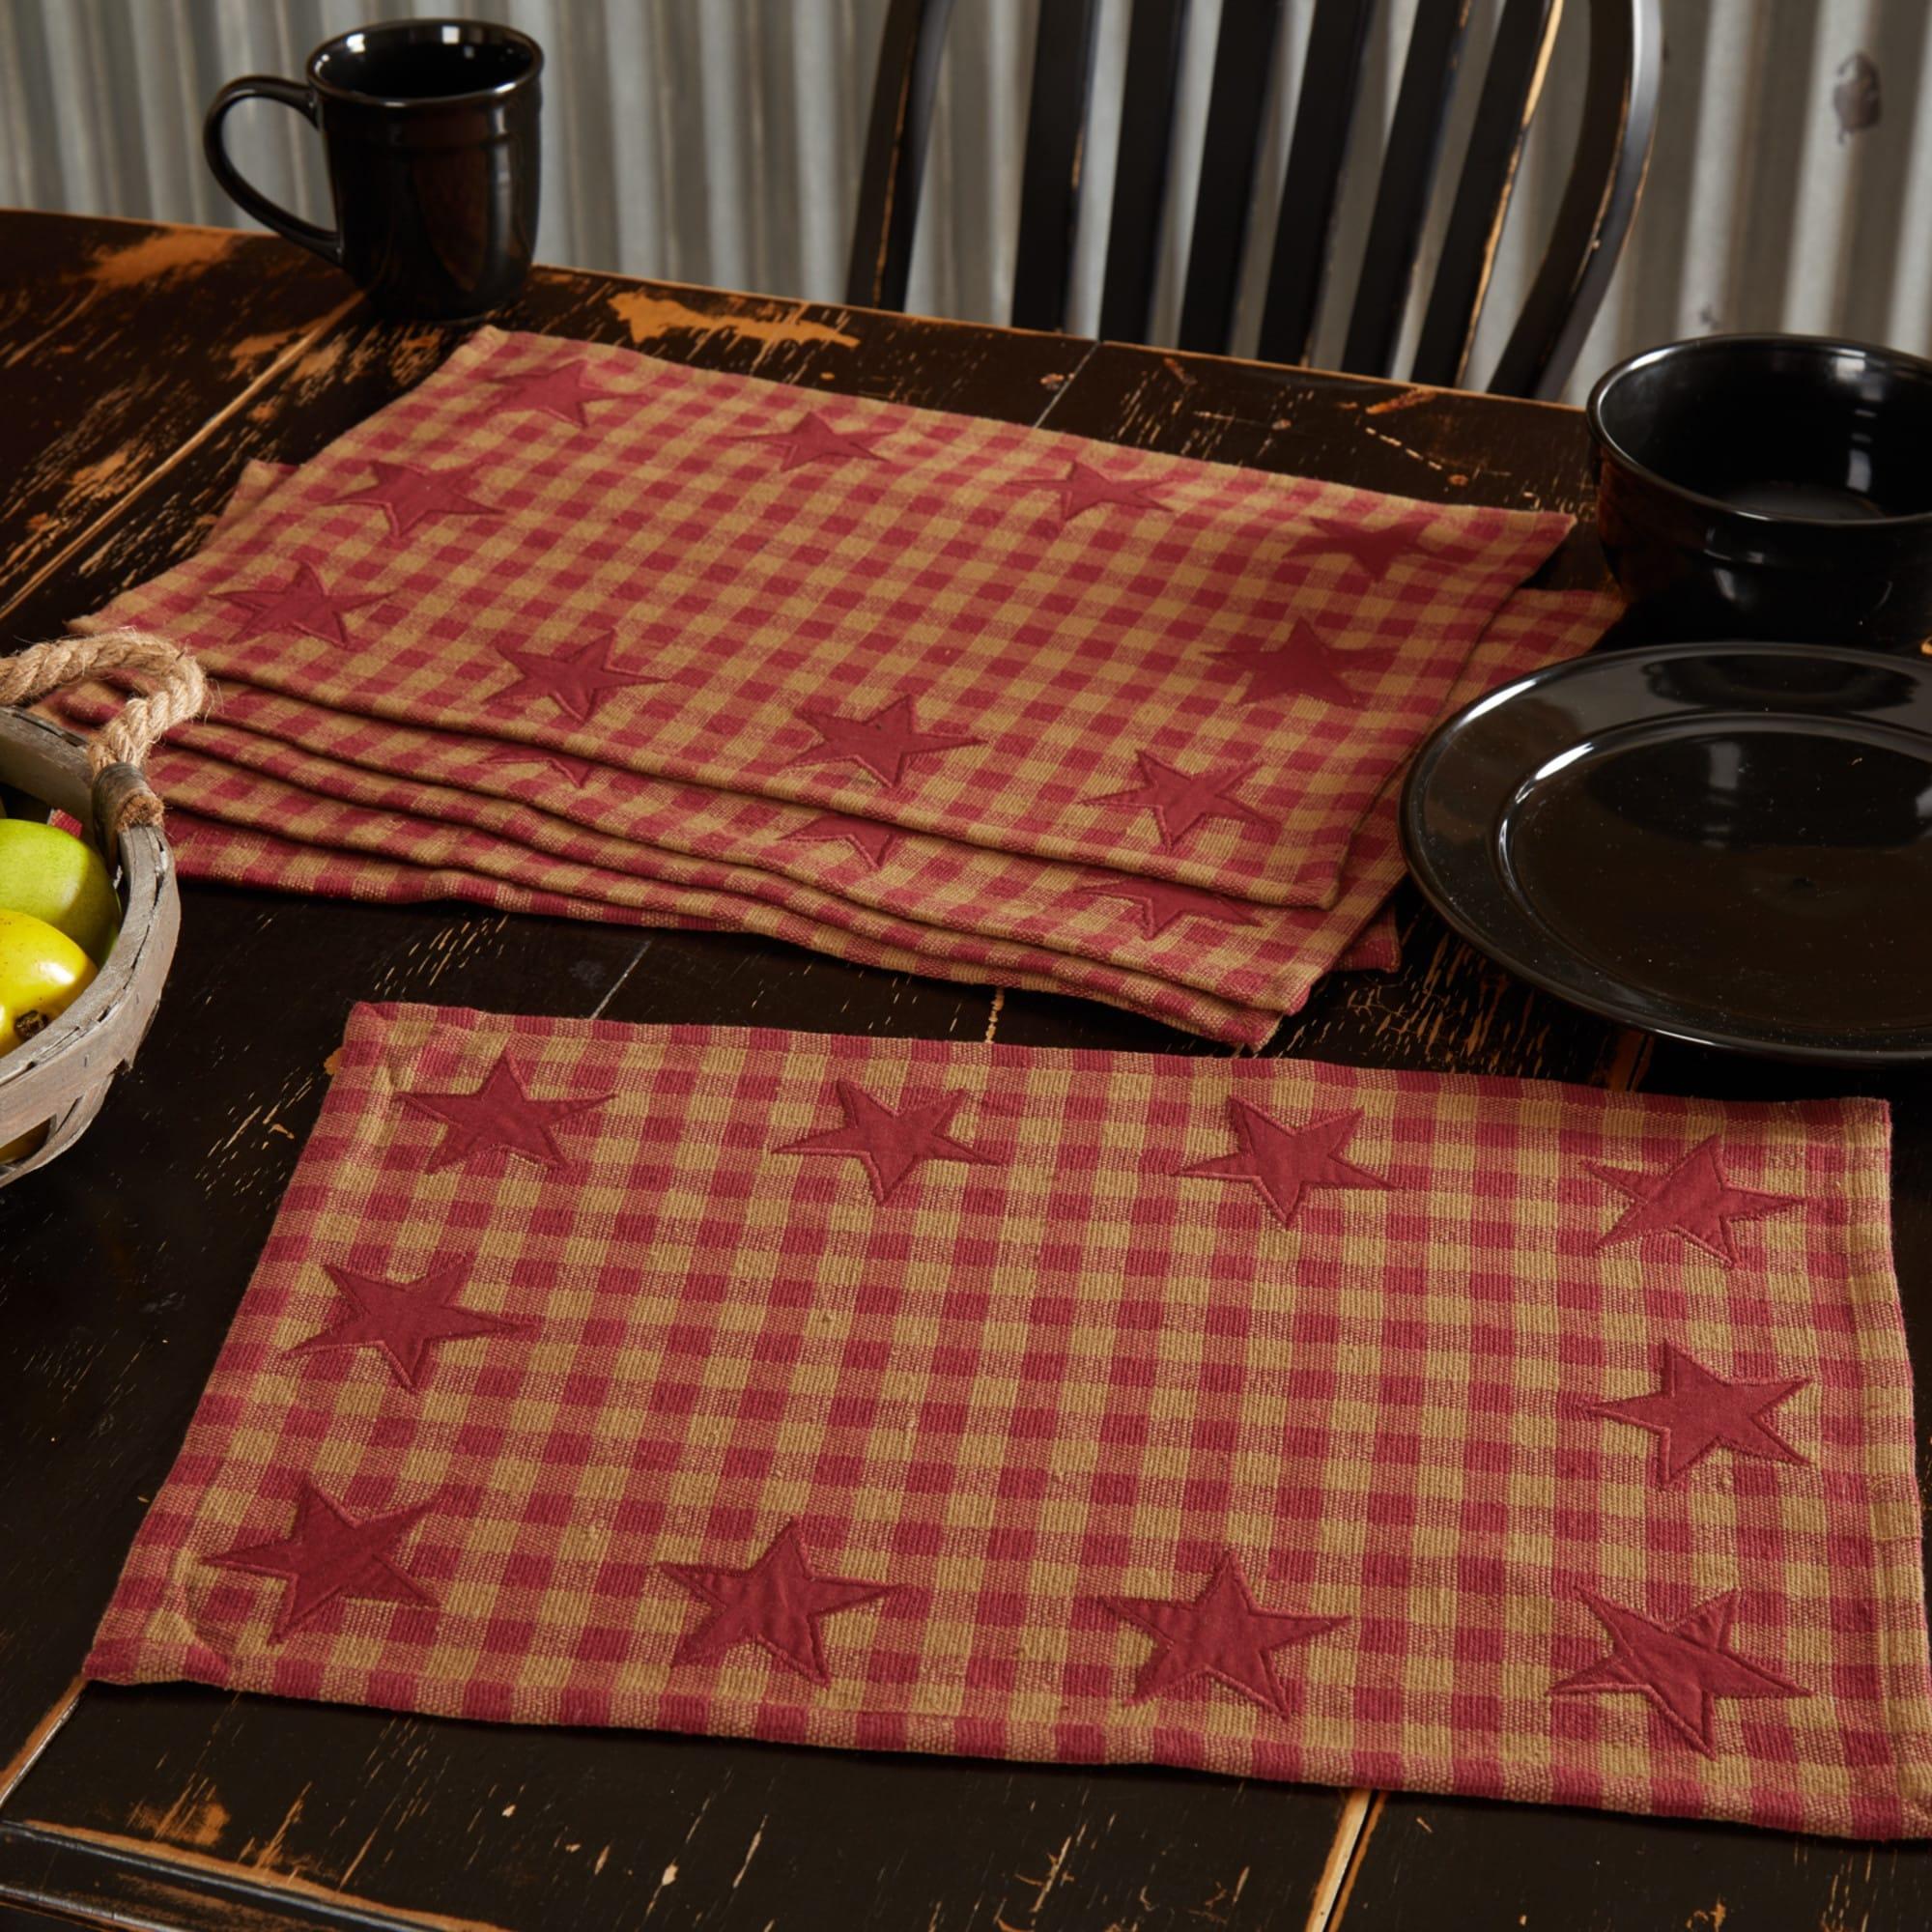 VHC Farmhouse Placemat Set of 6 Thanksgiving Tabletop Kitchen Burlap Vintage Tan